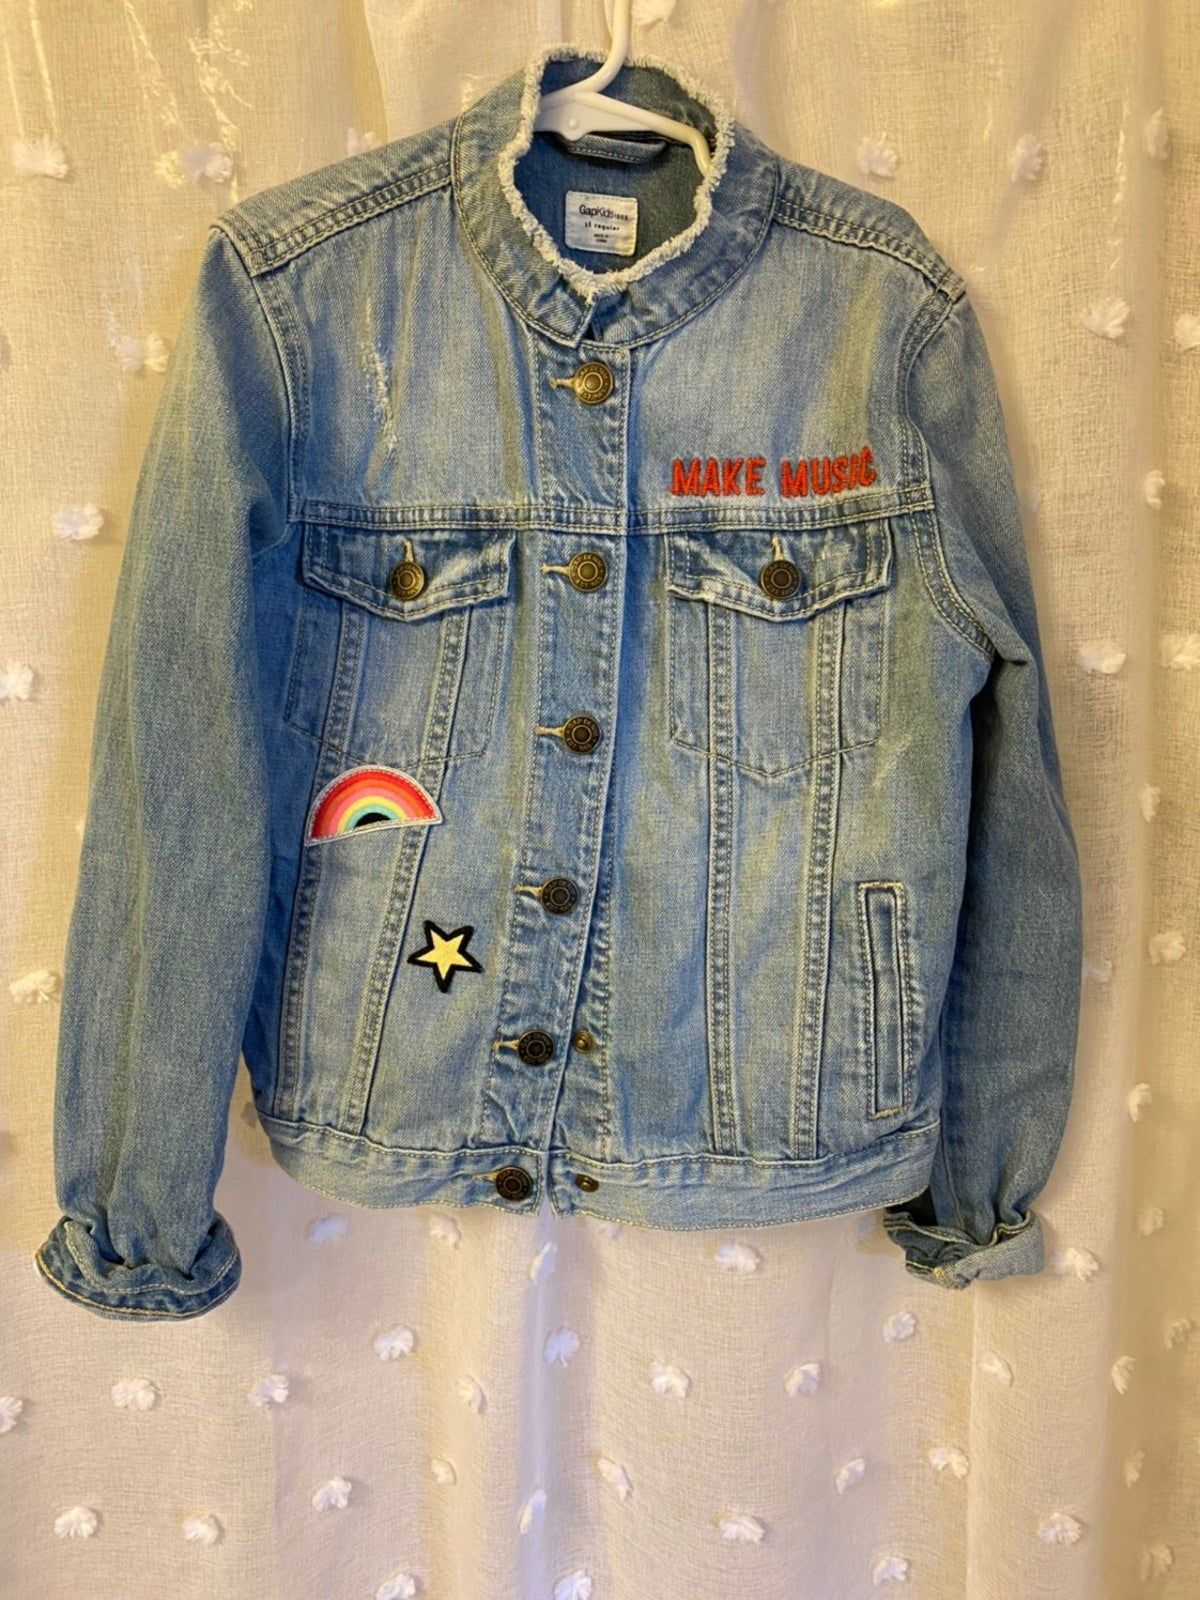 Jean Jacket Kids Denim Jacket Jackets Denim Jacket Patches [ 1600 x 1200 Pixel ]